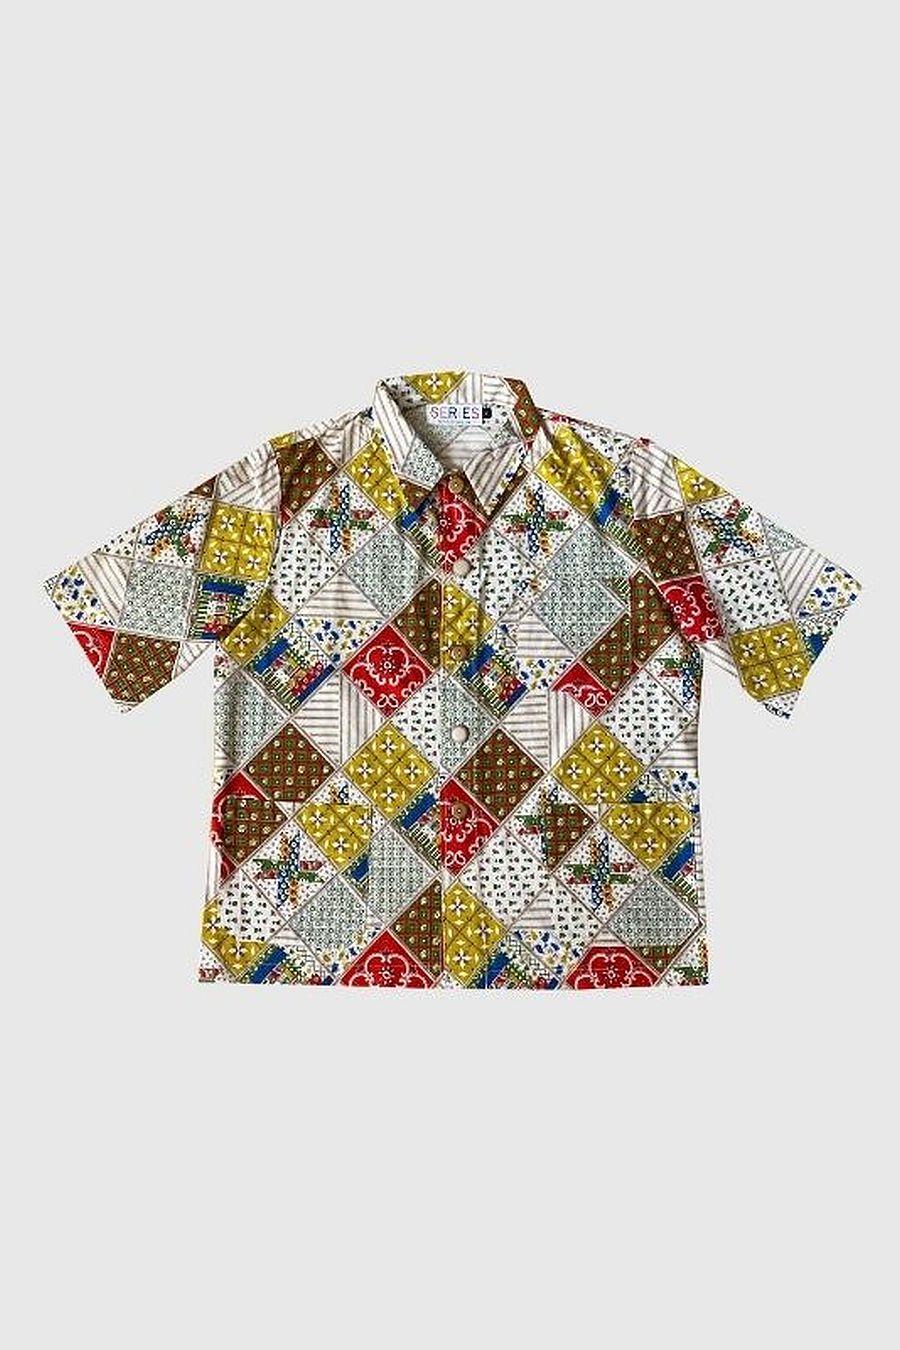 The Series NY Chore Shirt - CSCH005